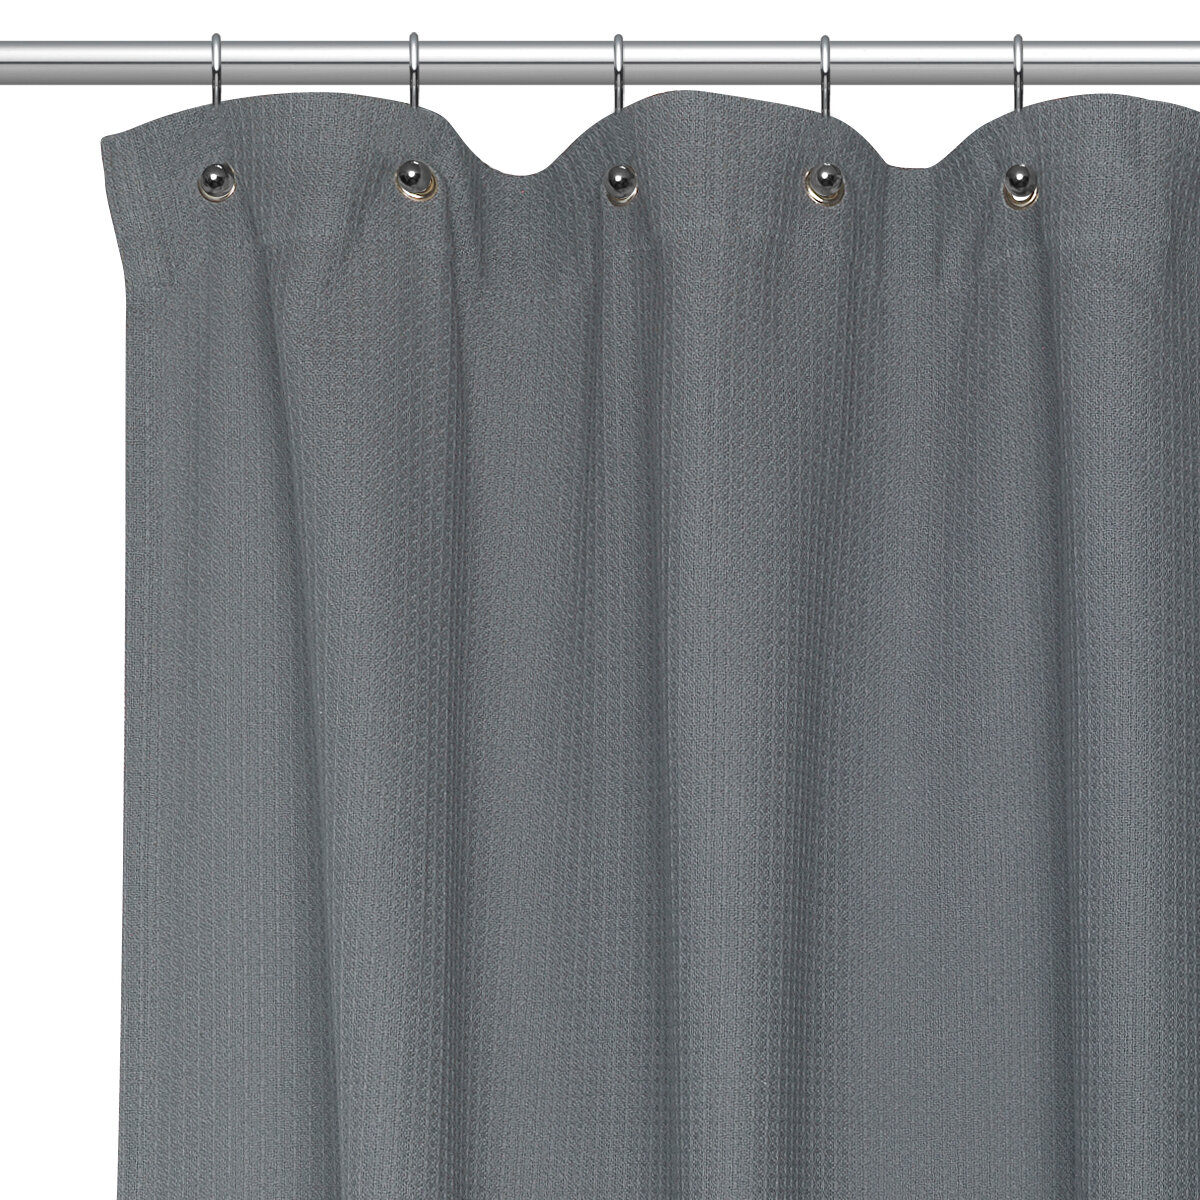 Orren Ellis Homerton Waffle Weave Cotton Single Shower